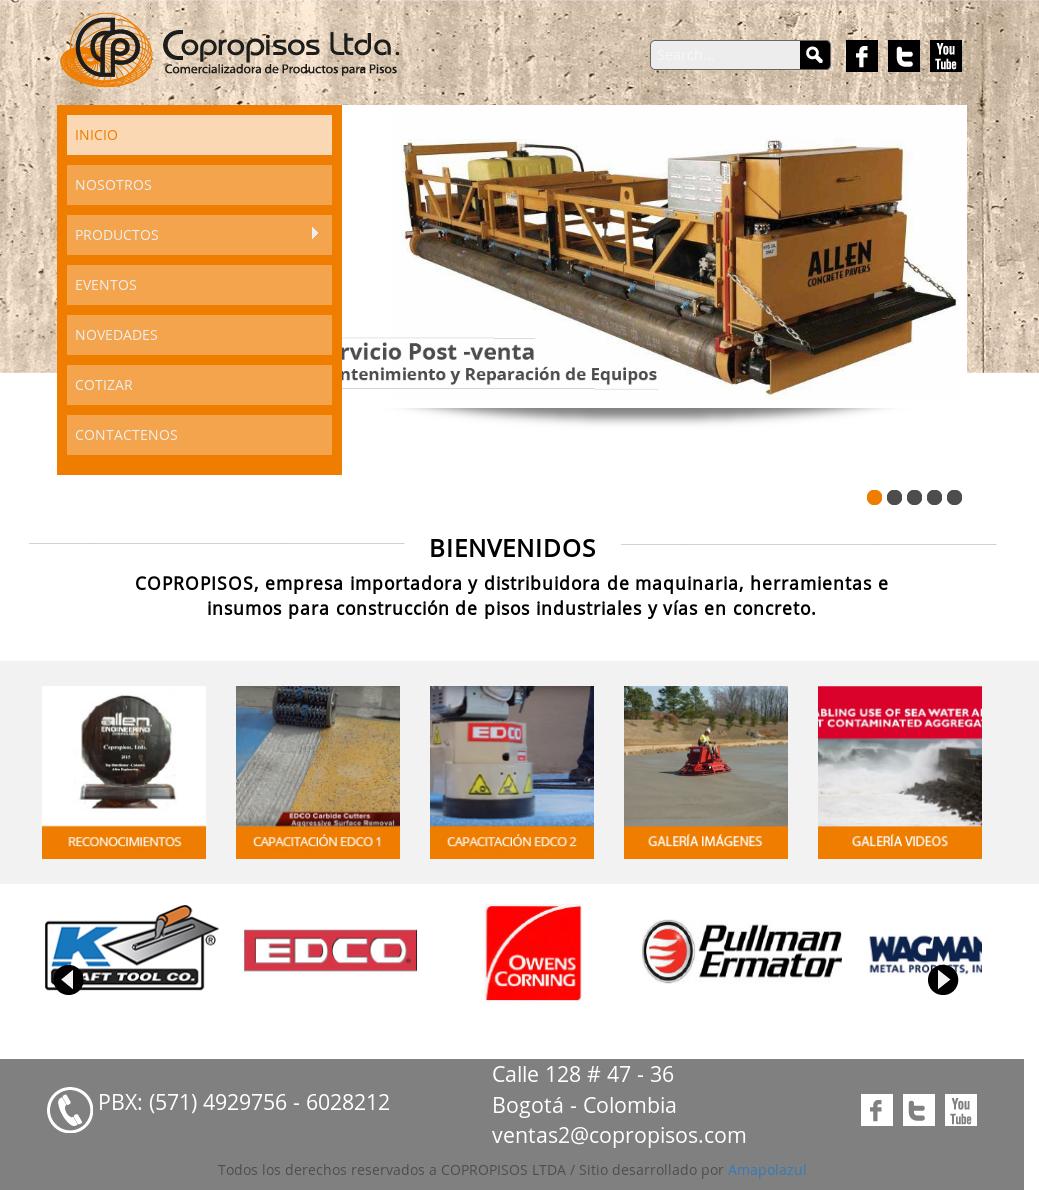 Copropisos Ltda Competitors, Revenue and Employees - Owler